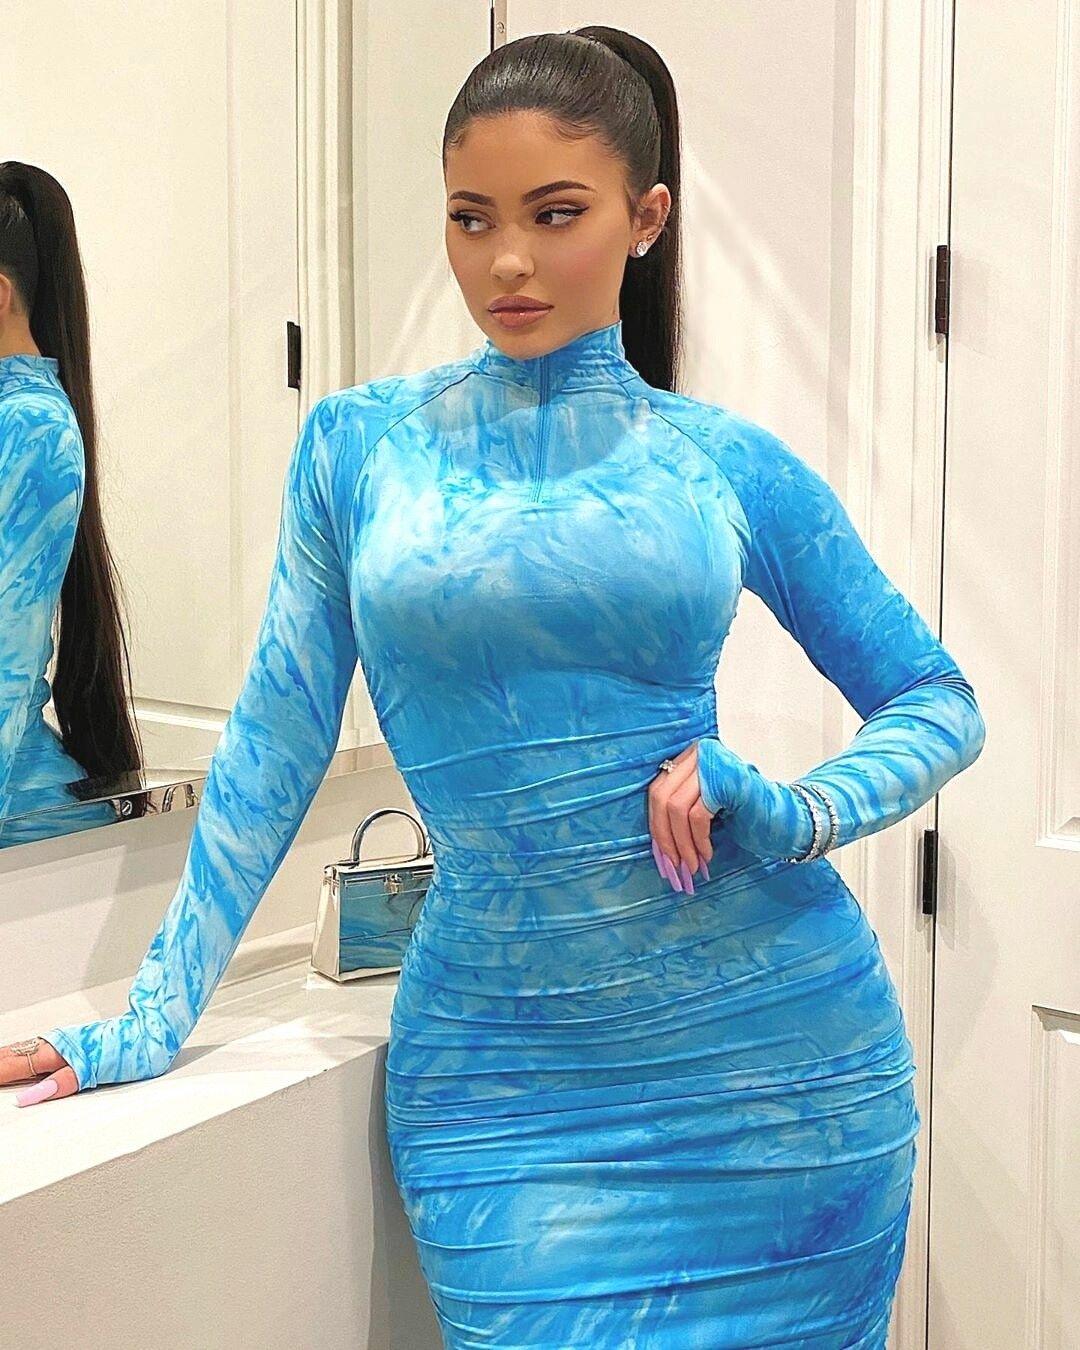 Kylie Jenner /January'2020/ в 2020 г Наряды кайли дженнер